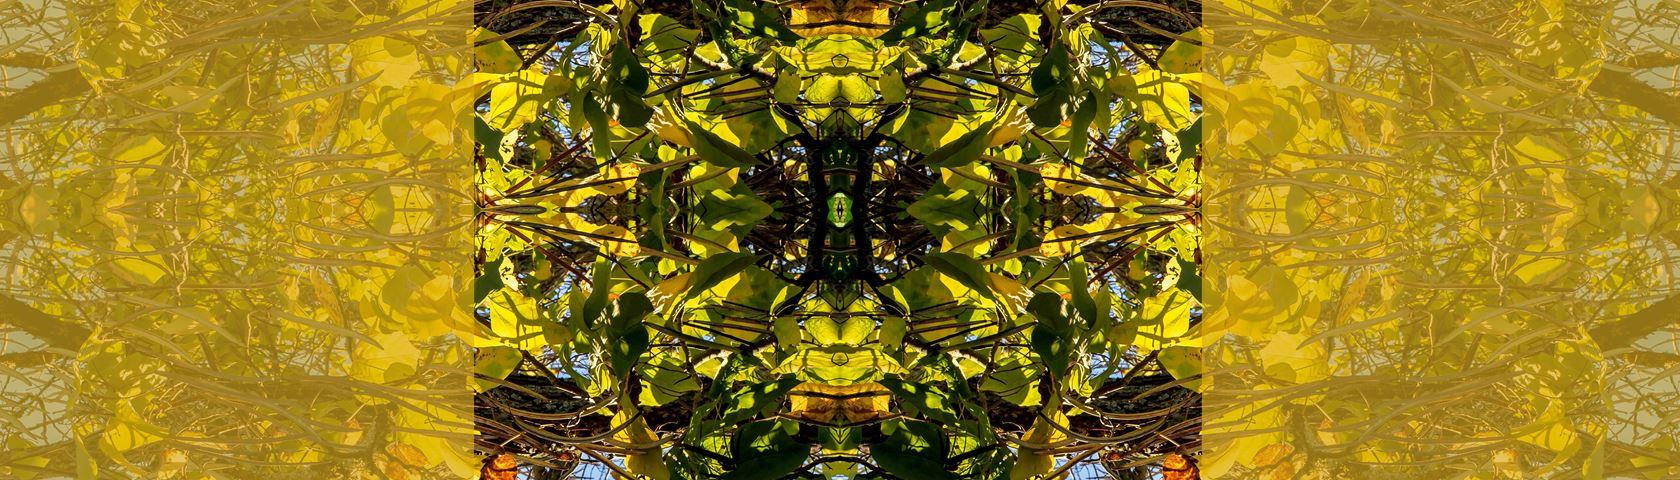 Catalpa Tree Symmetry with Gold Tones